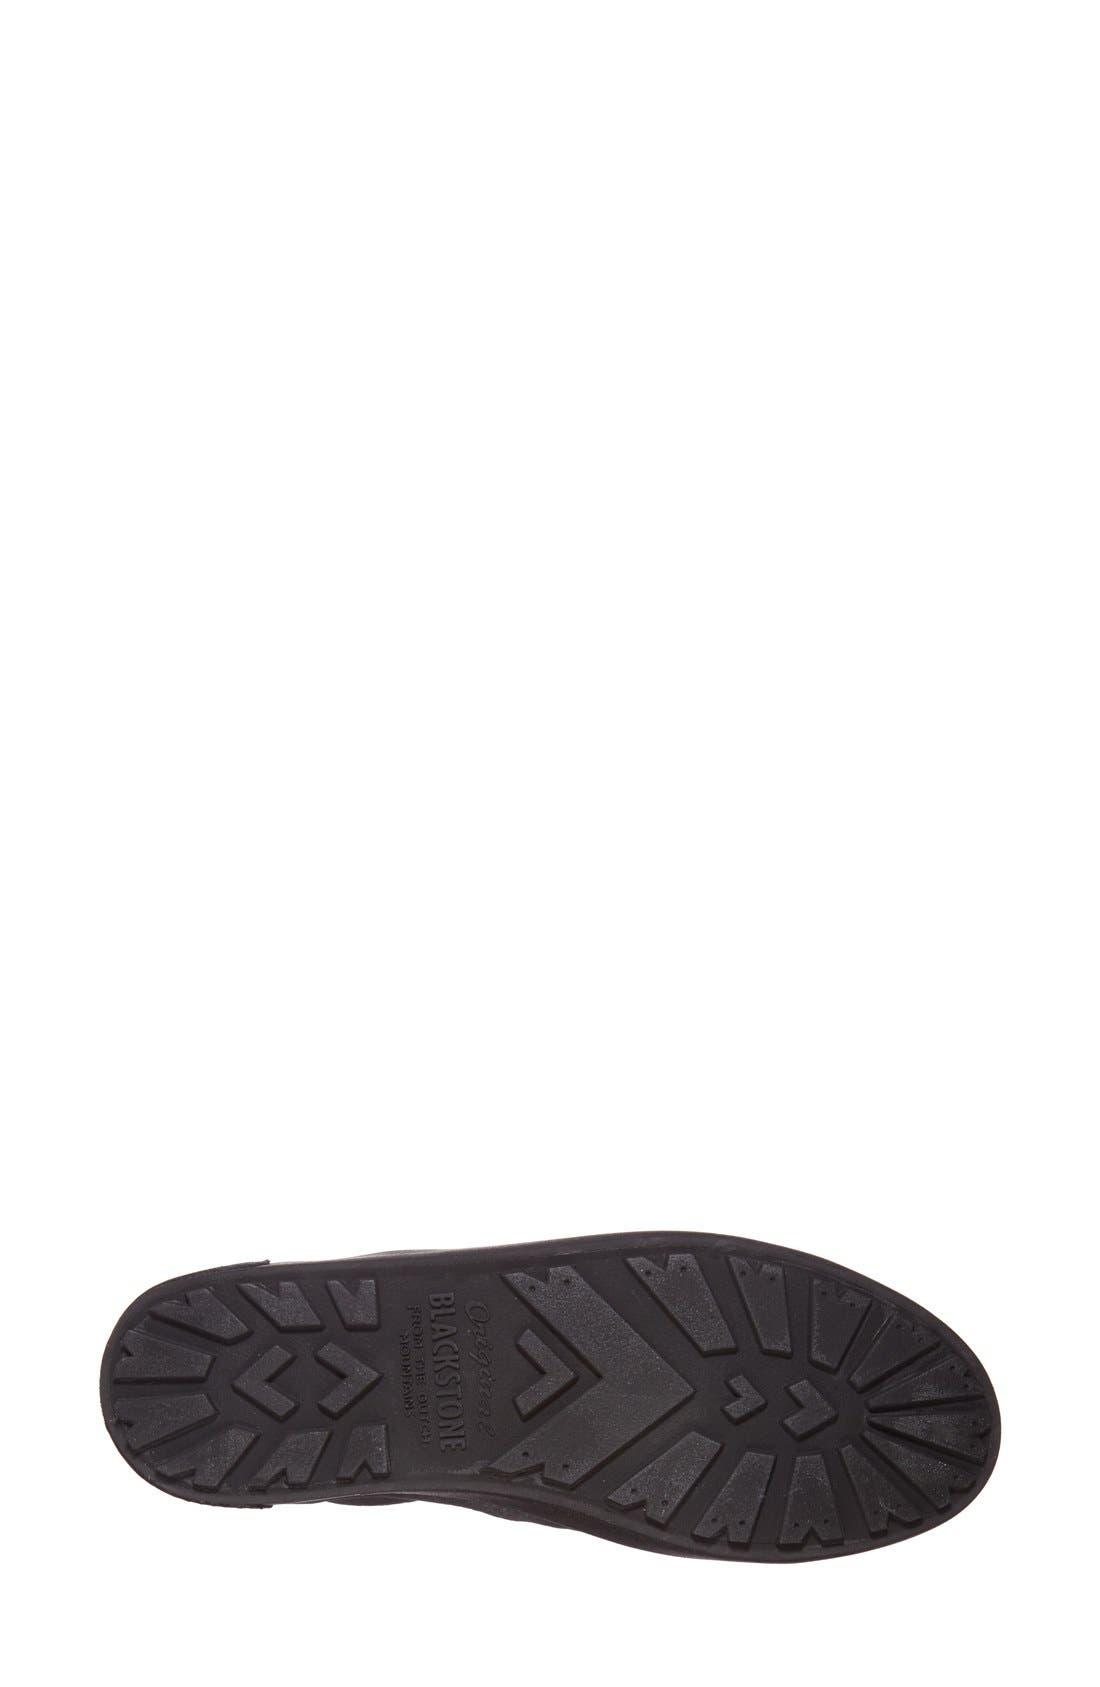 BLACKSTONE,                             'JL17' Sneaker,                             Alternate thumbnail 4, color,                             BLACK METALLIC